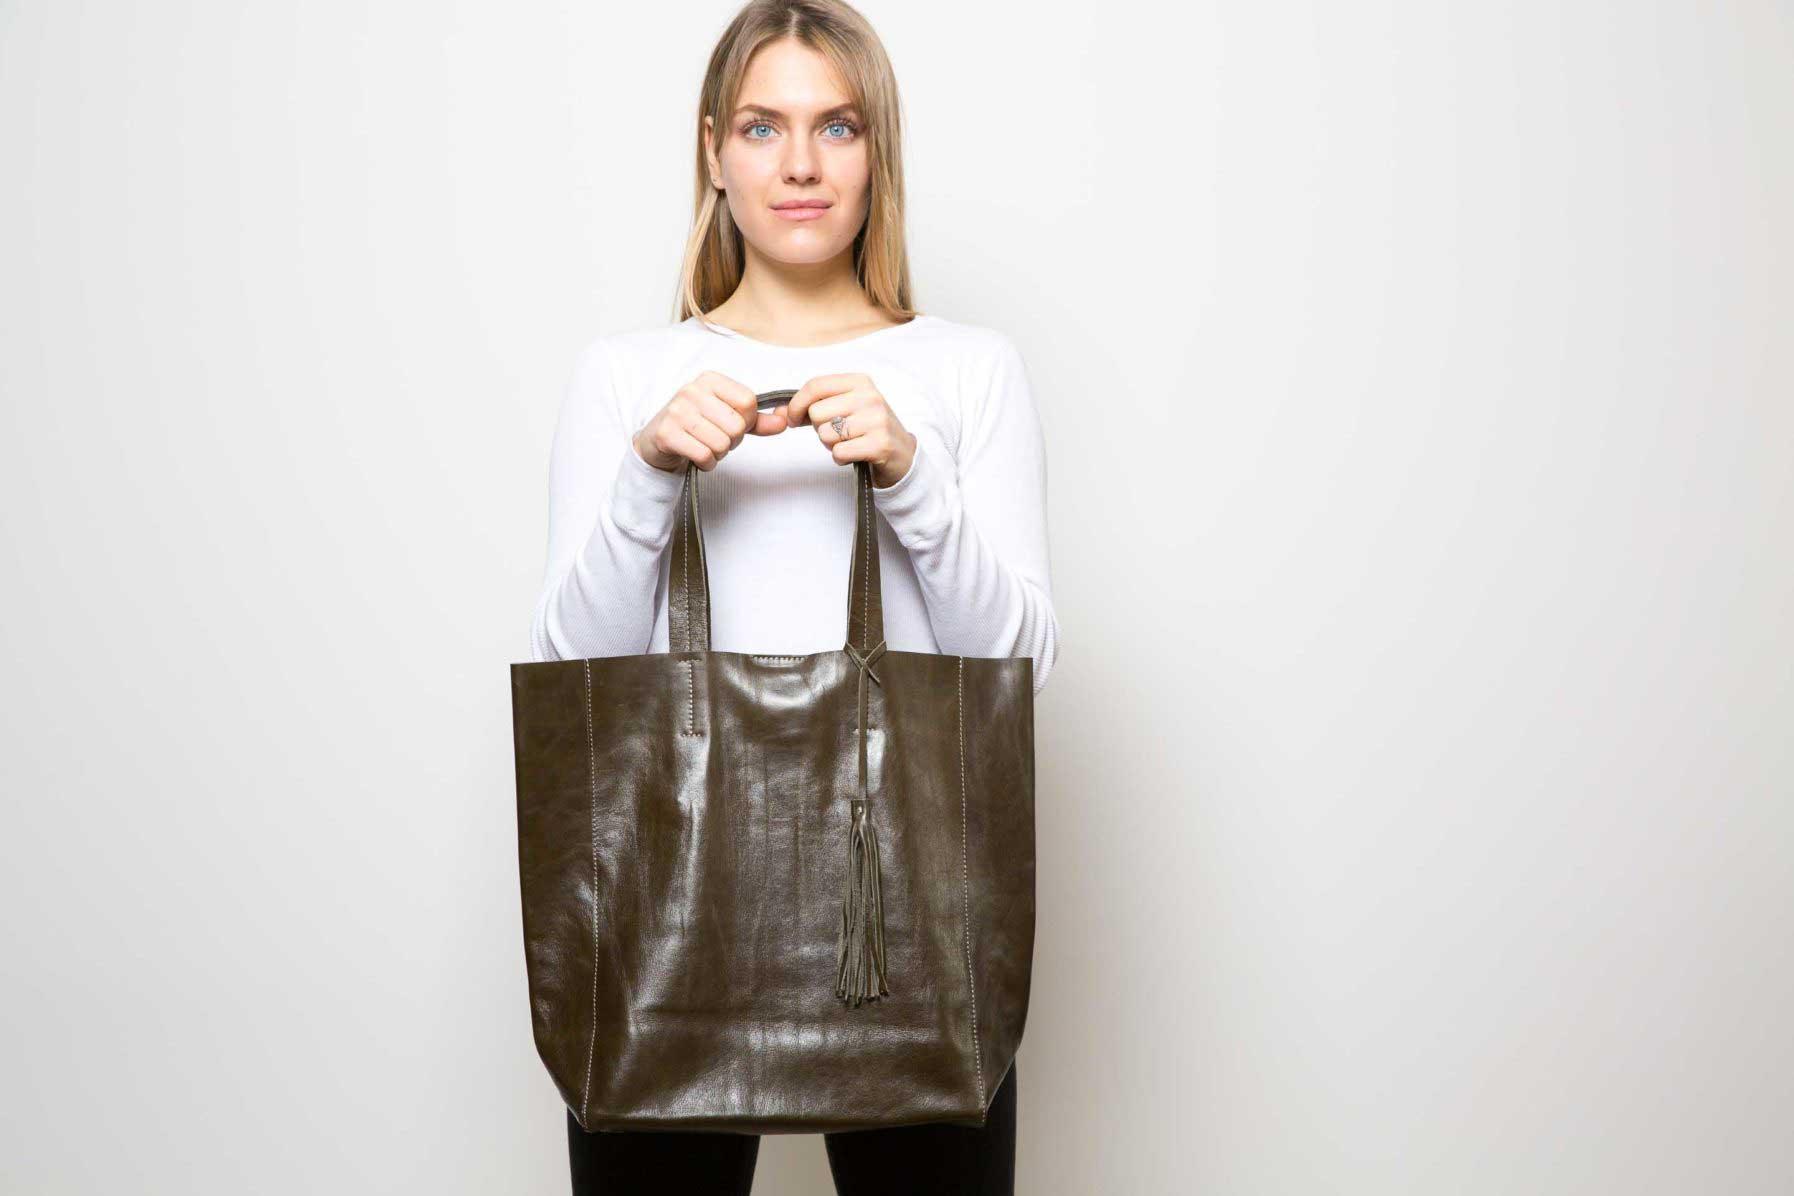 Visuel - Sac Grand Shopper En Cuir Bronze - Porté de face - ordinari.shop